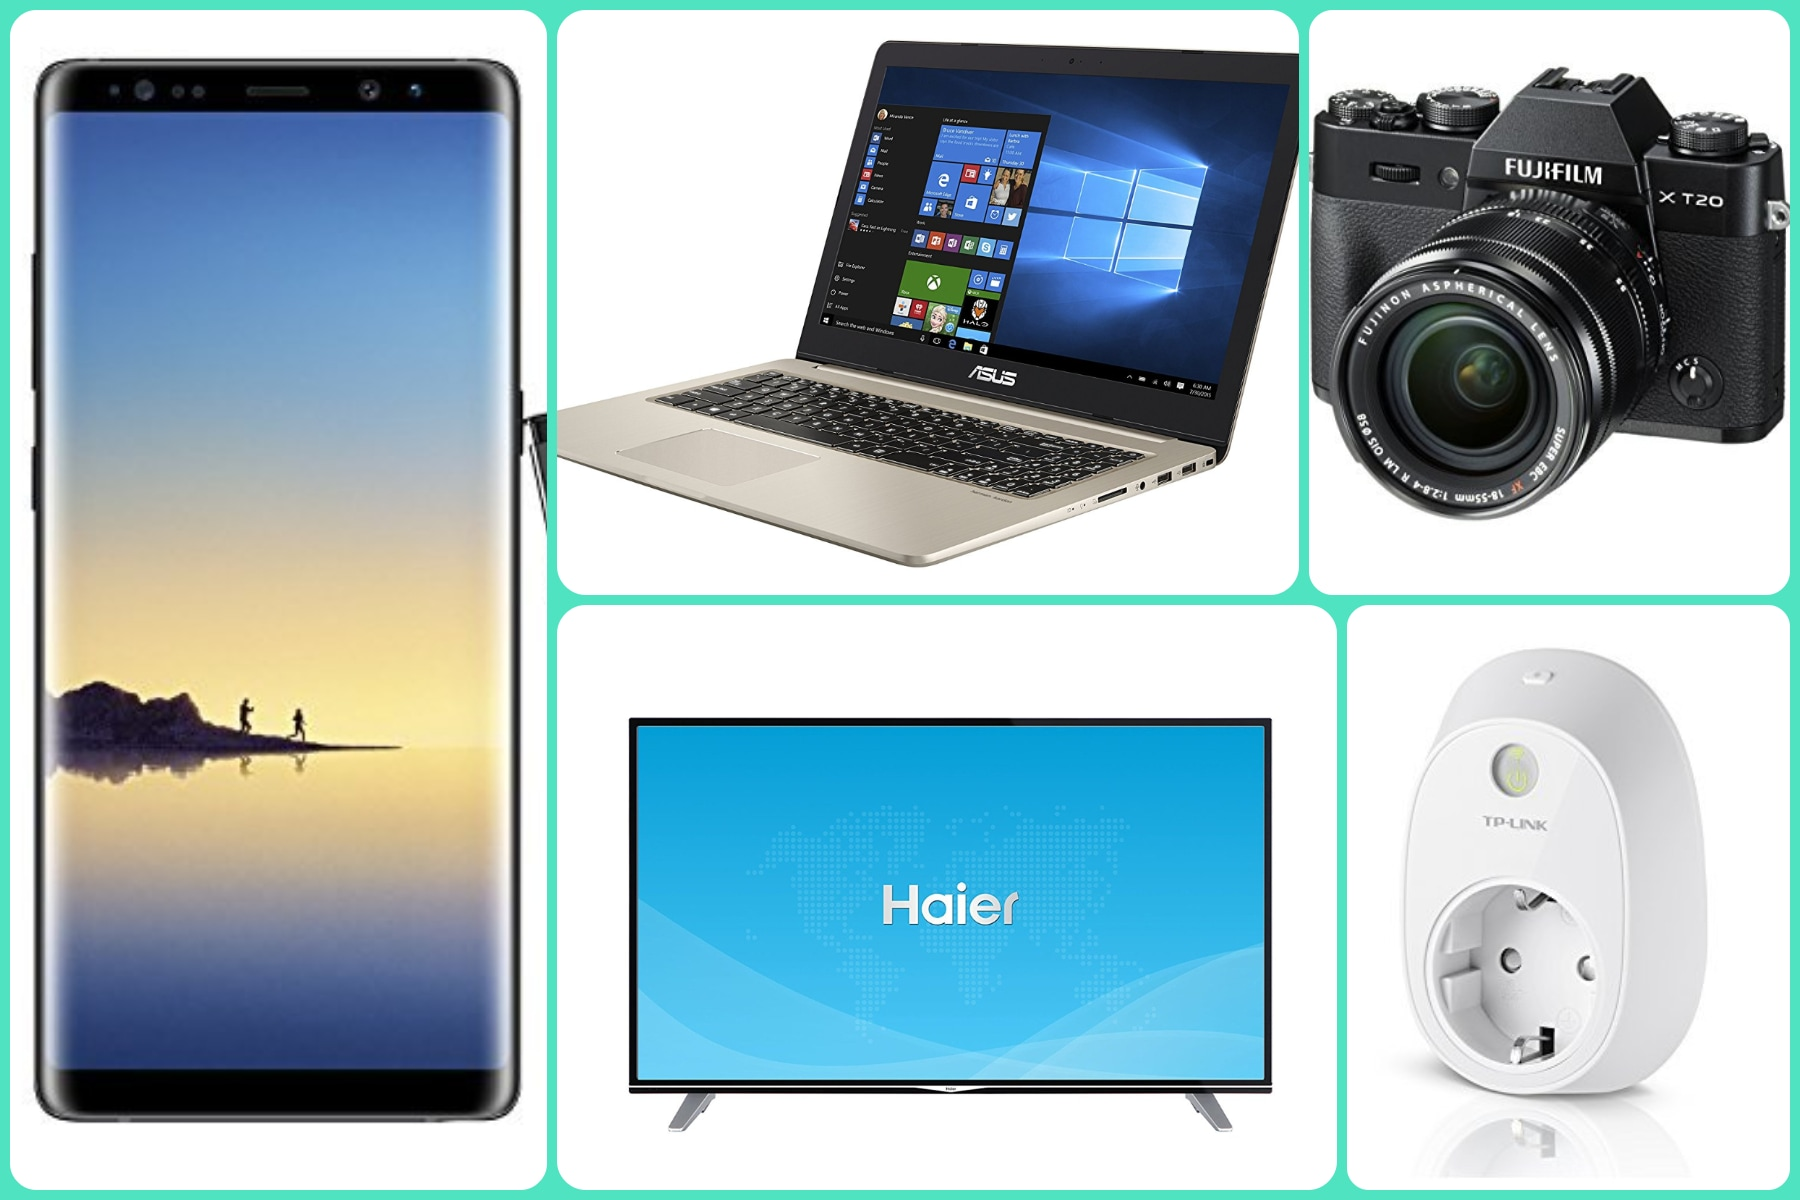 Su Amazon in offerta: Galaxy S9, power bank wireless, Hero Session, cuffie gaming - image migliori-offerte-amazon-15-marzo-2018 on http://www.zxbyte.com